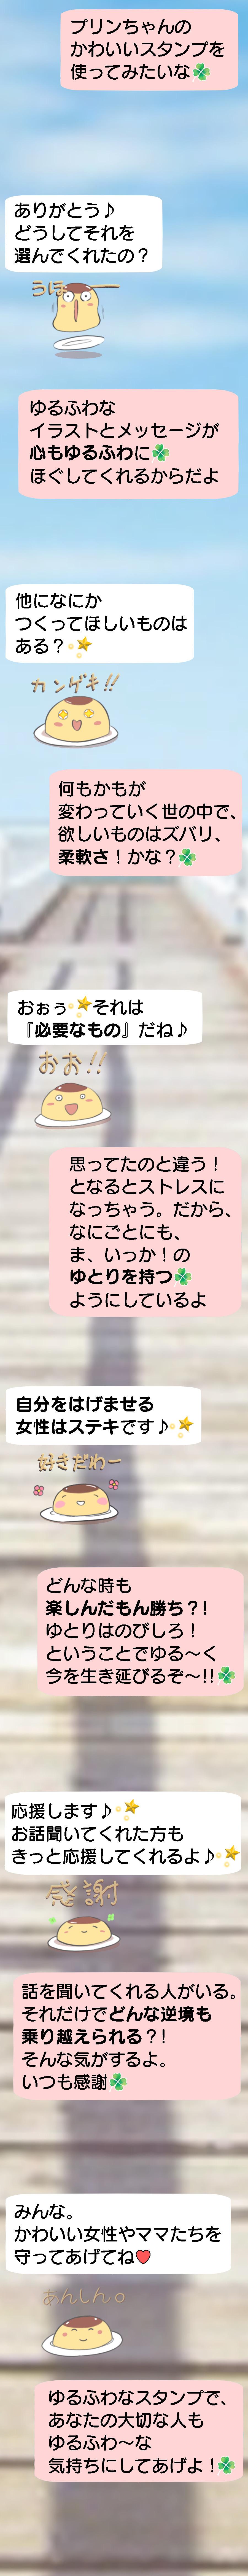 2021/01/13②